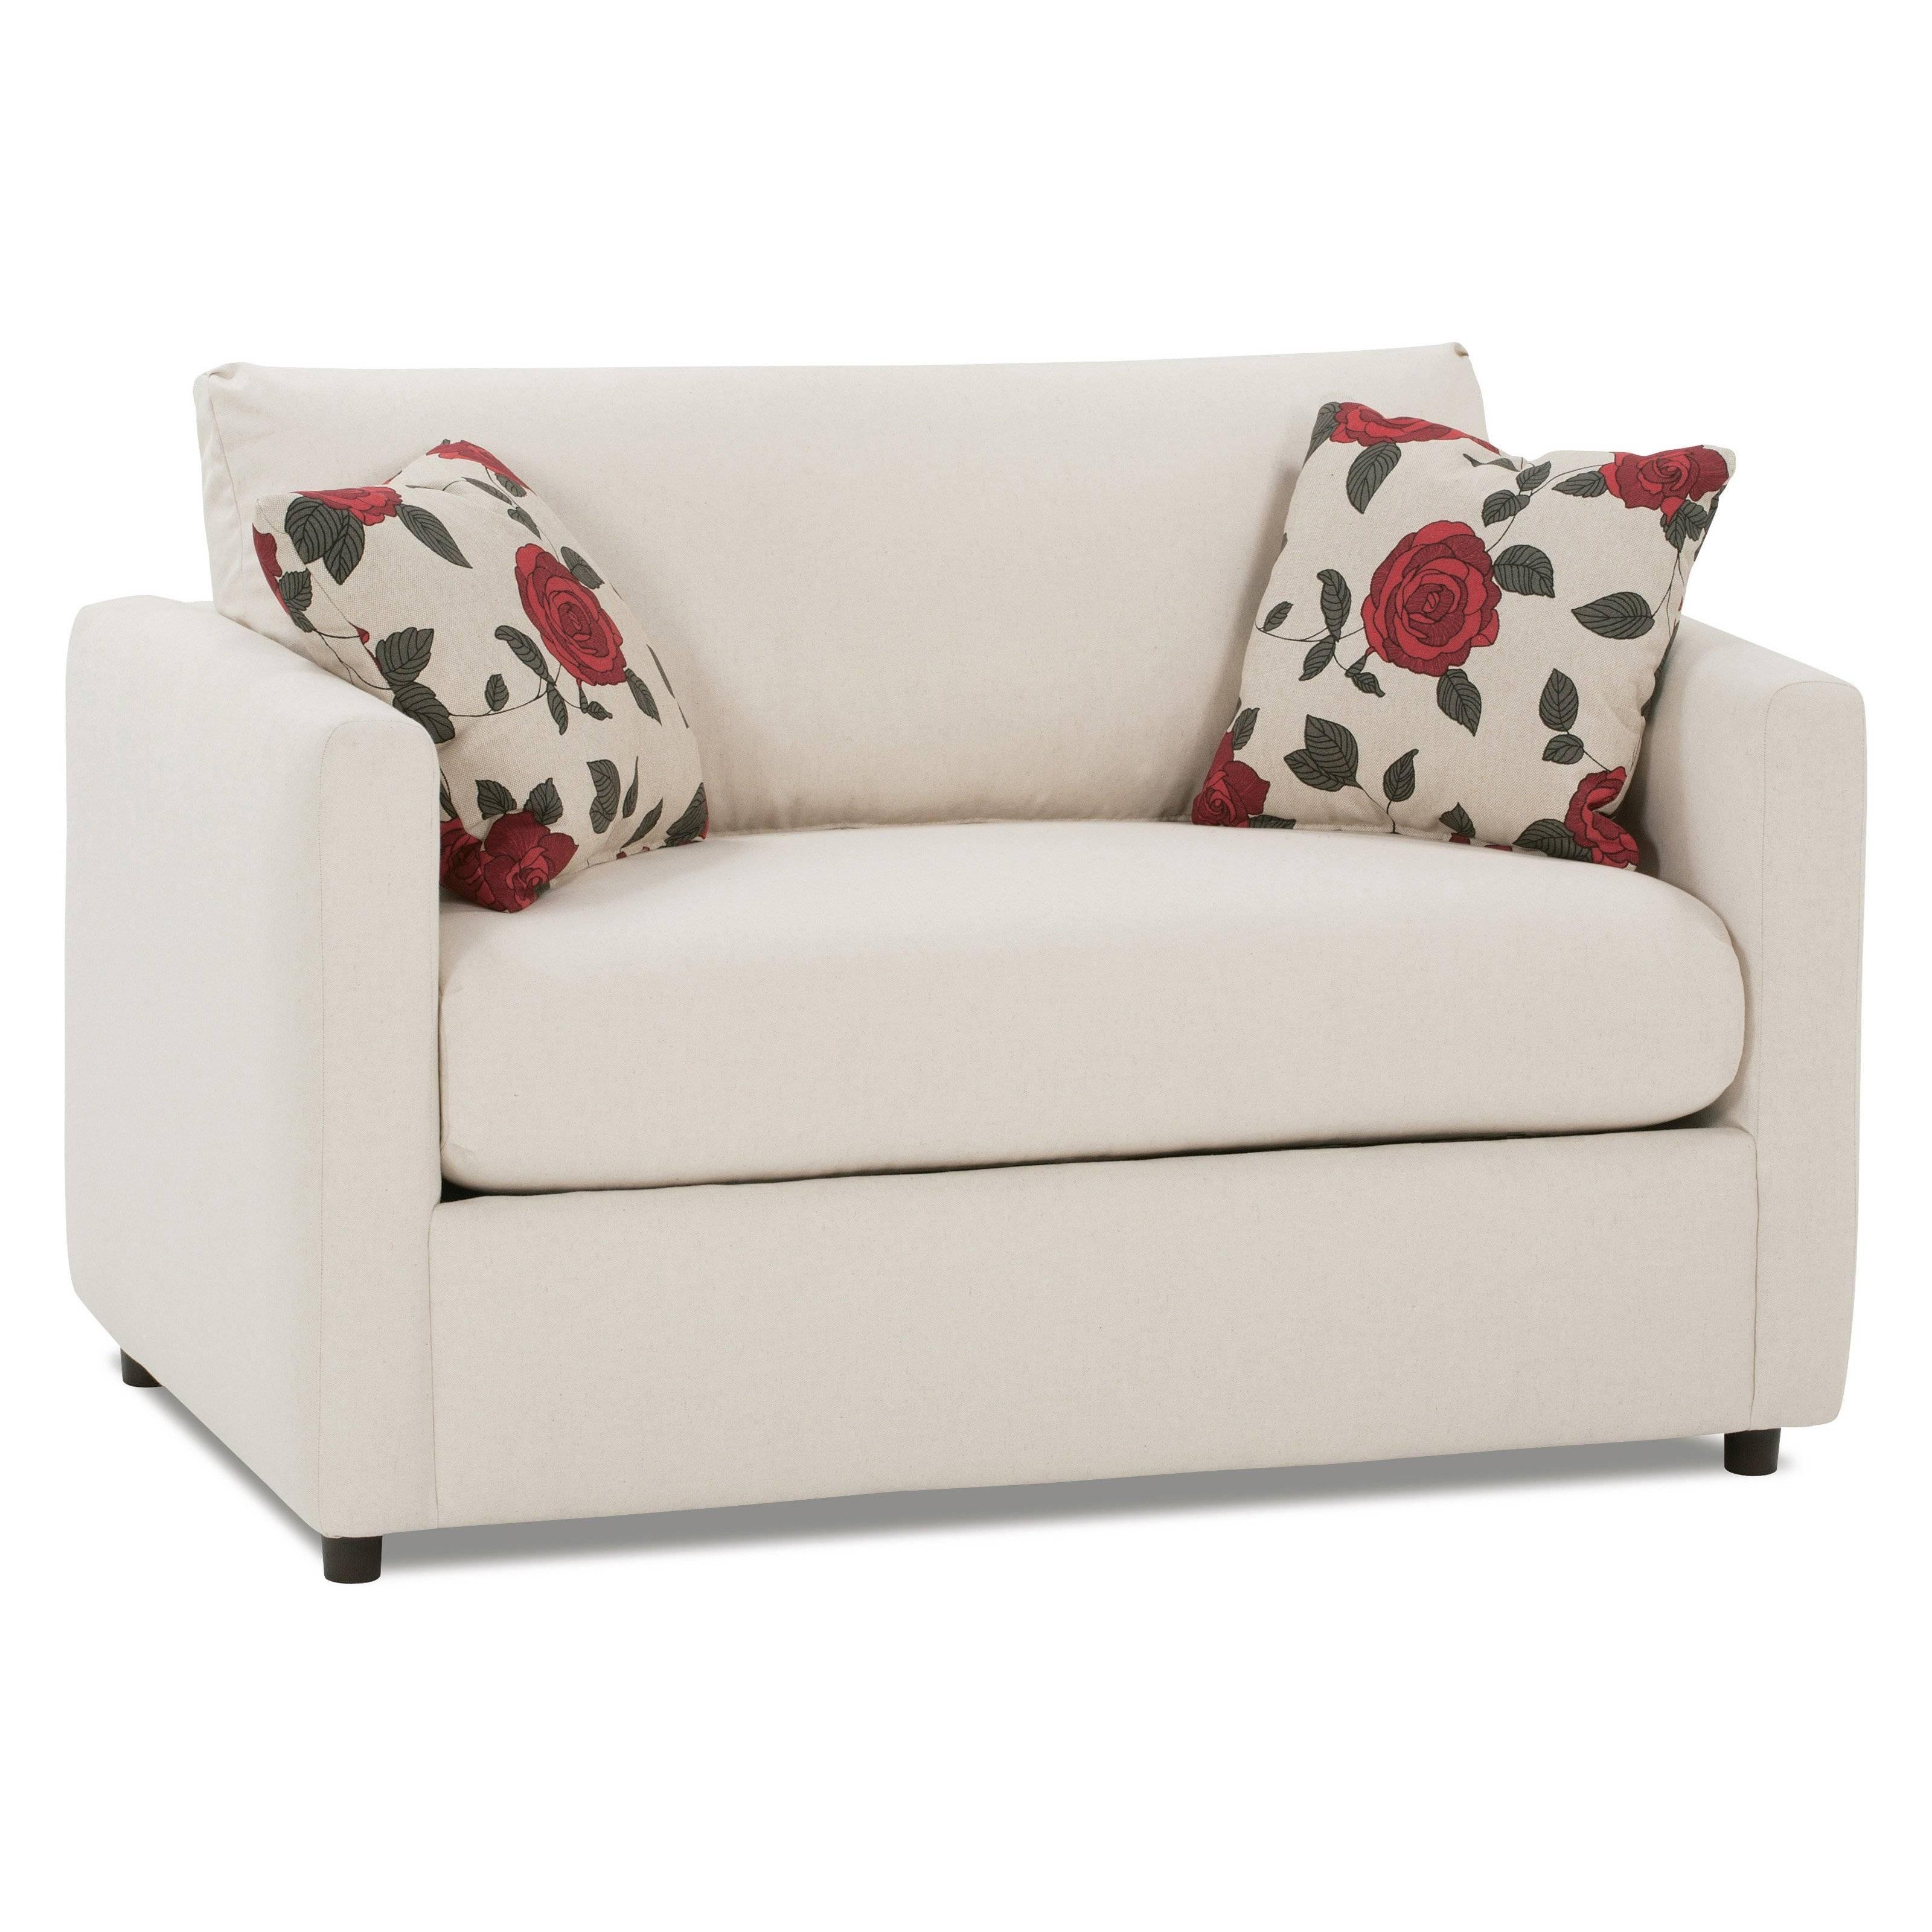 White Sleeper Sofa Ikea | Tehranmix Decoration for Ikea Loveseat Sleeper Sofas (Image 29 of 30)